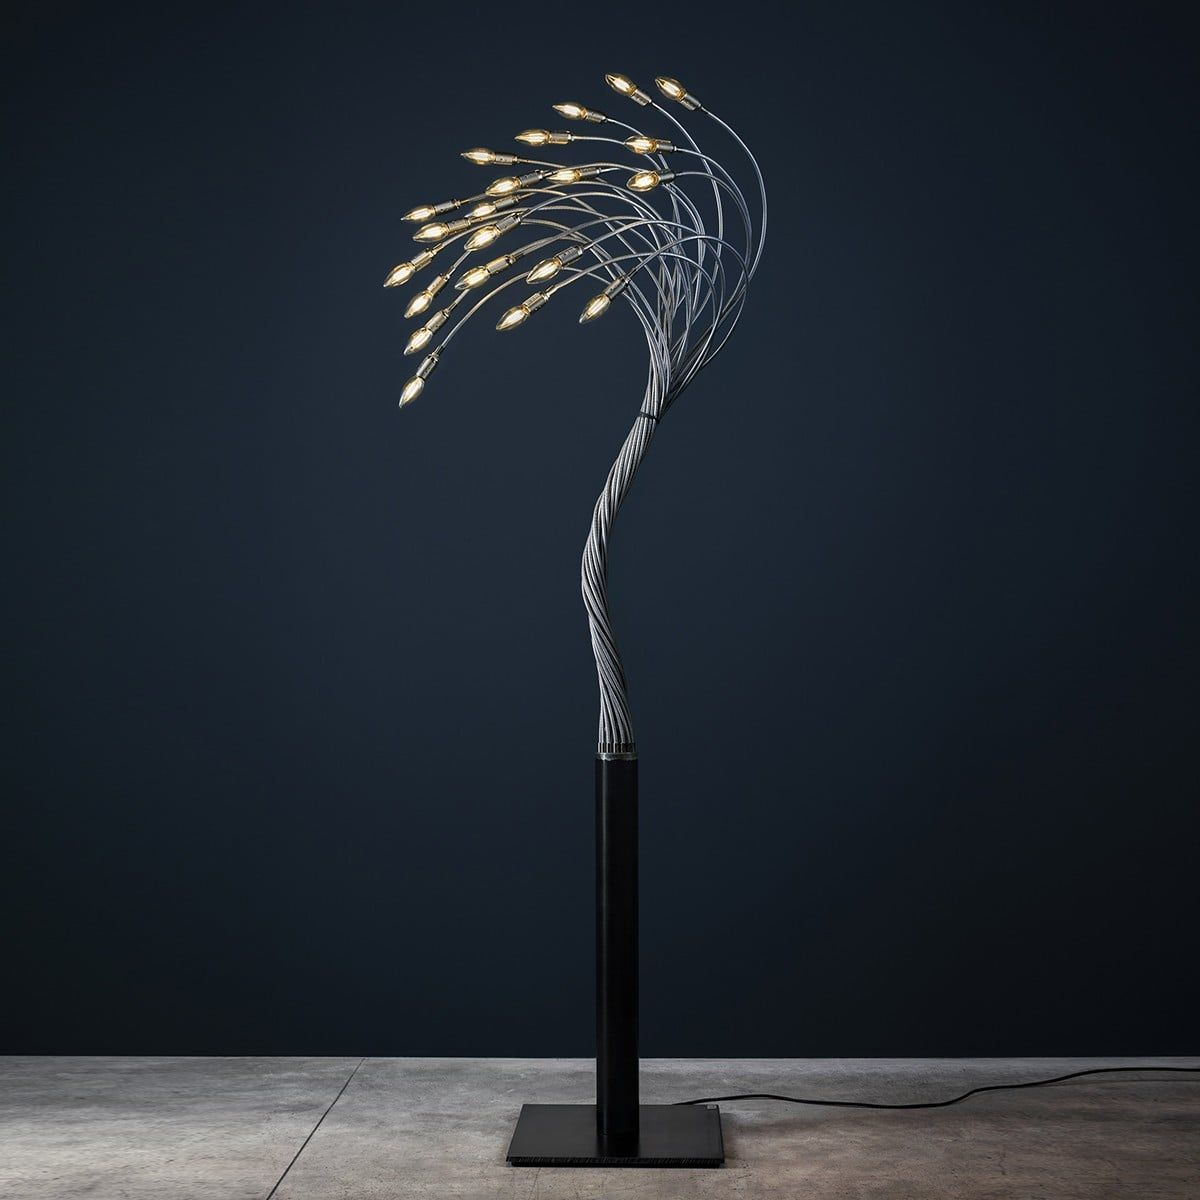 Catellani Smith Sottovento 15 Stehleuchte 15 Flg Nickel Stehlampe Weiss Grosse Stehlampe Stehlampe Schwarz